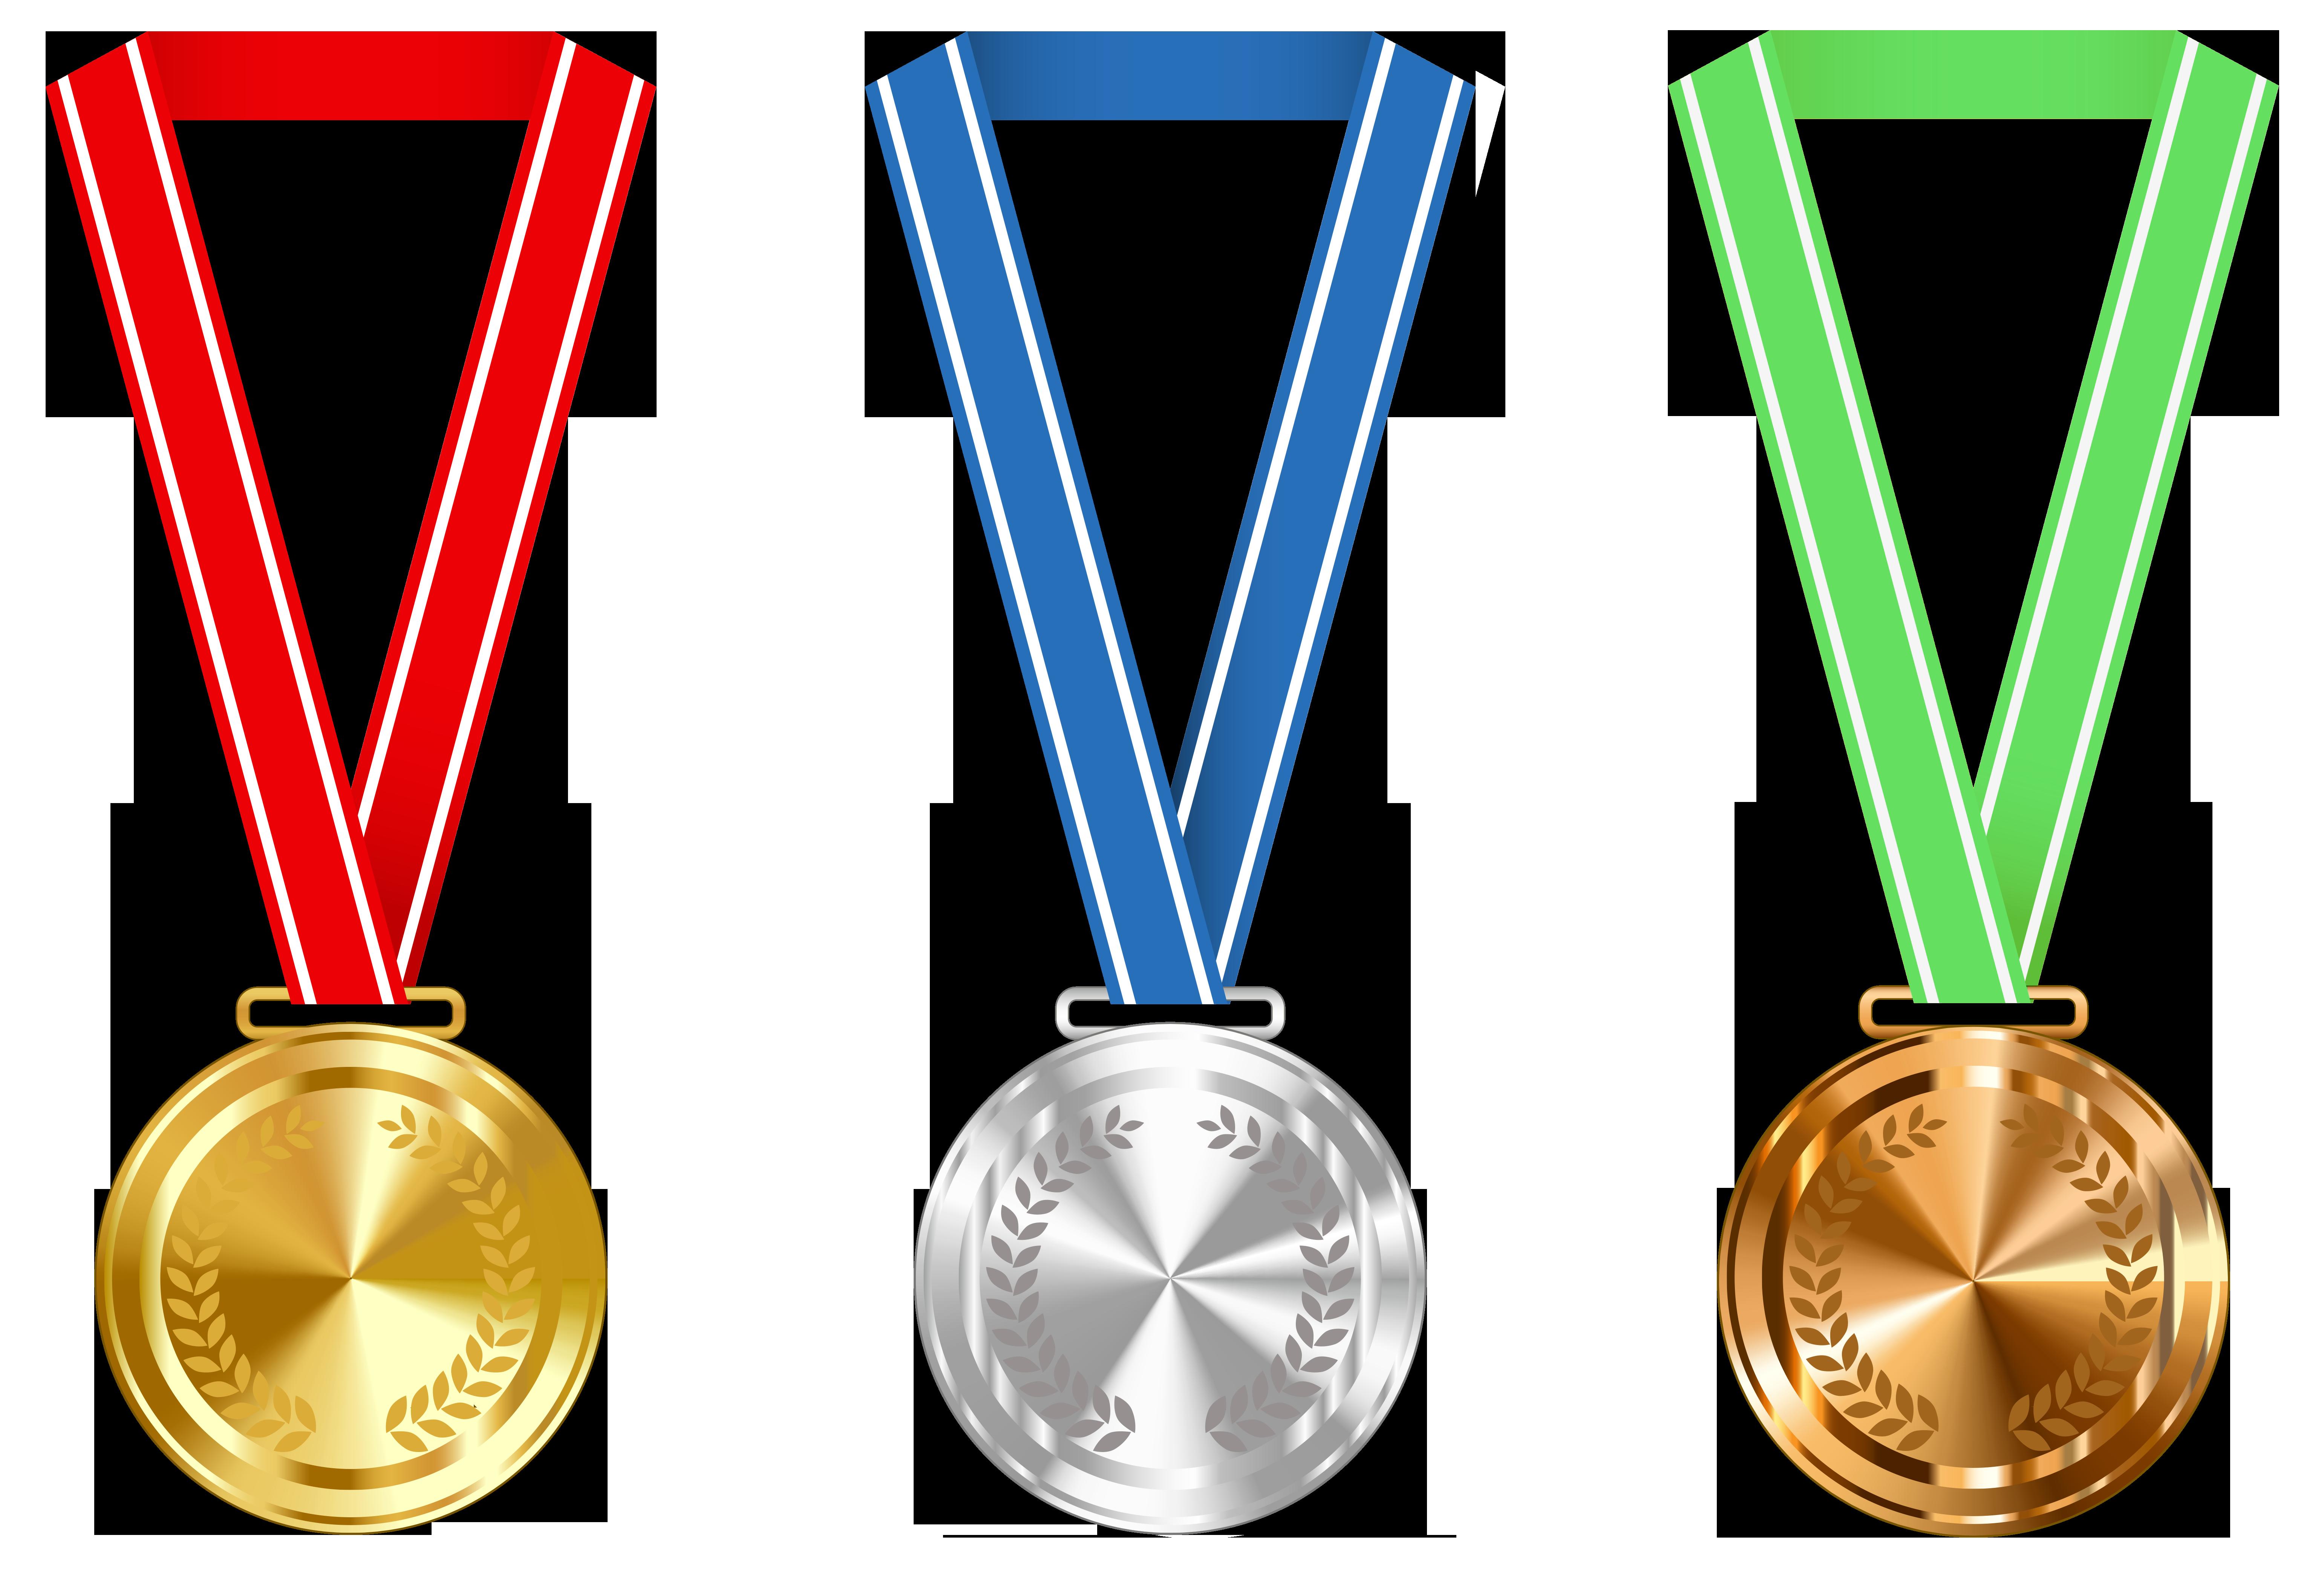 Gold Medal Clipart - . - Gold Medal Clip Art